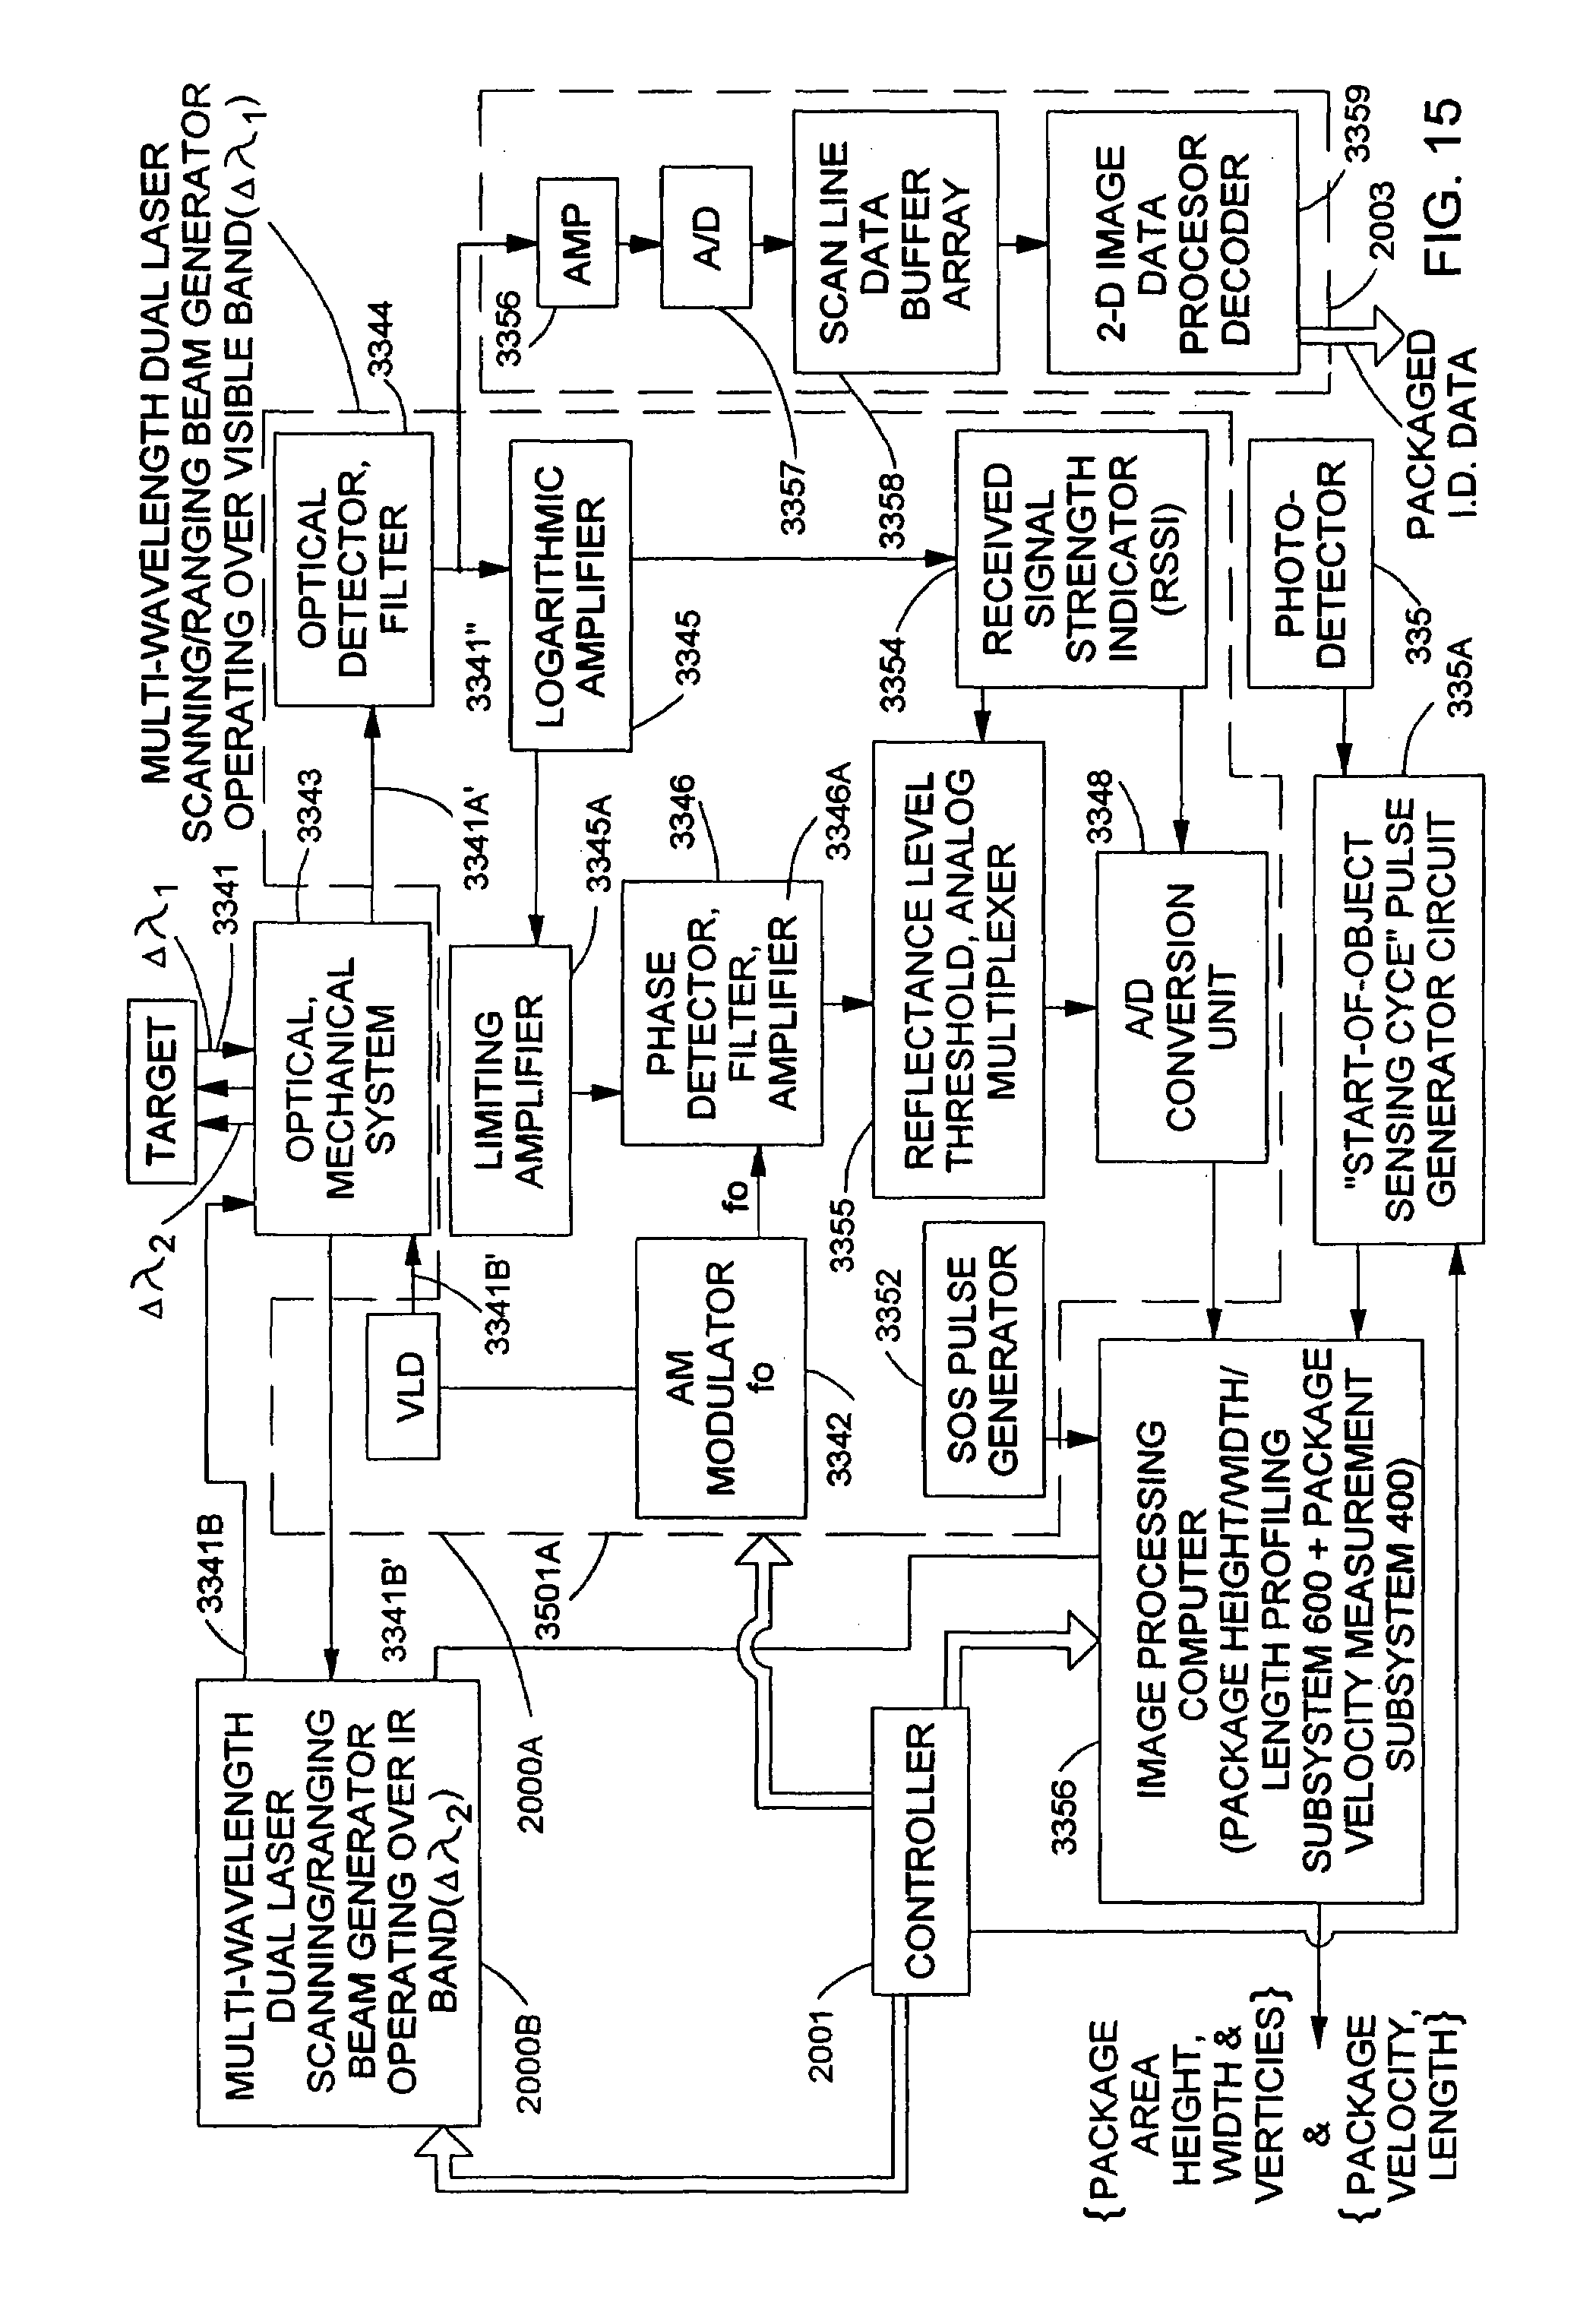 Patent Us 7527205 B2 Worthington C Wiring Diagram Images